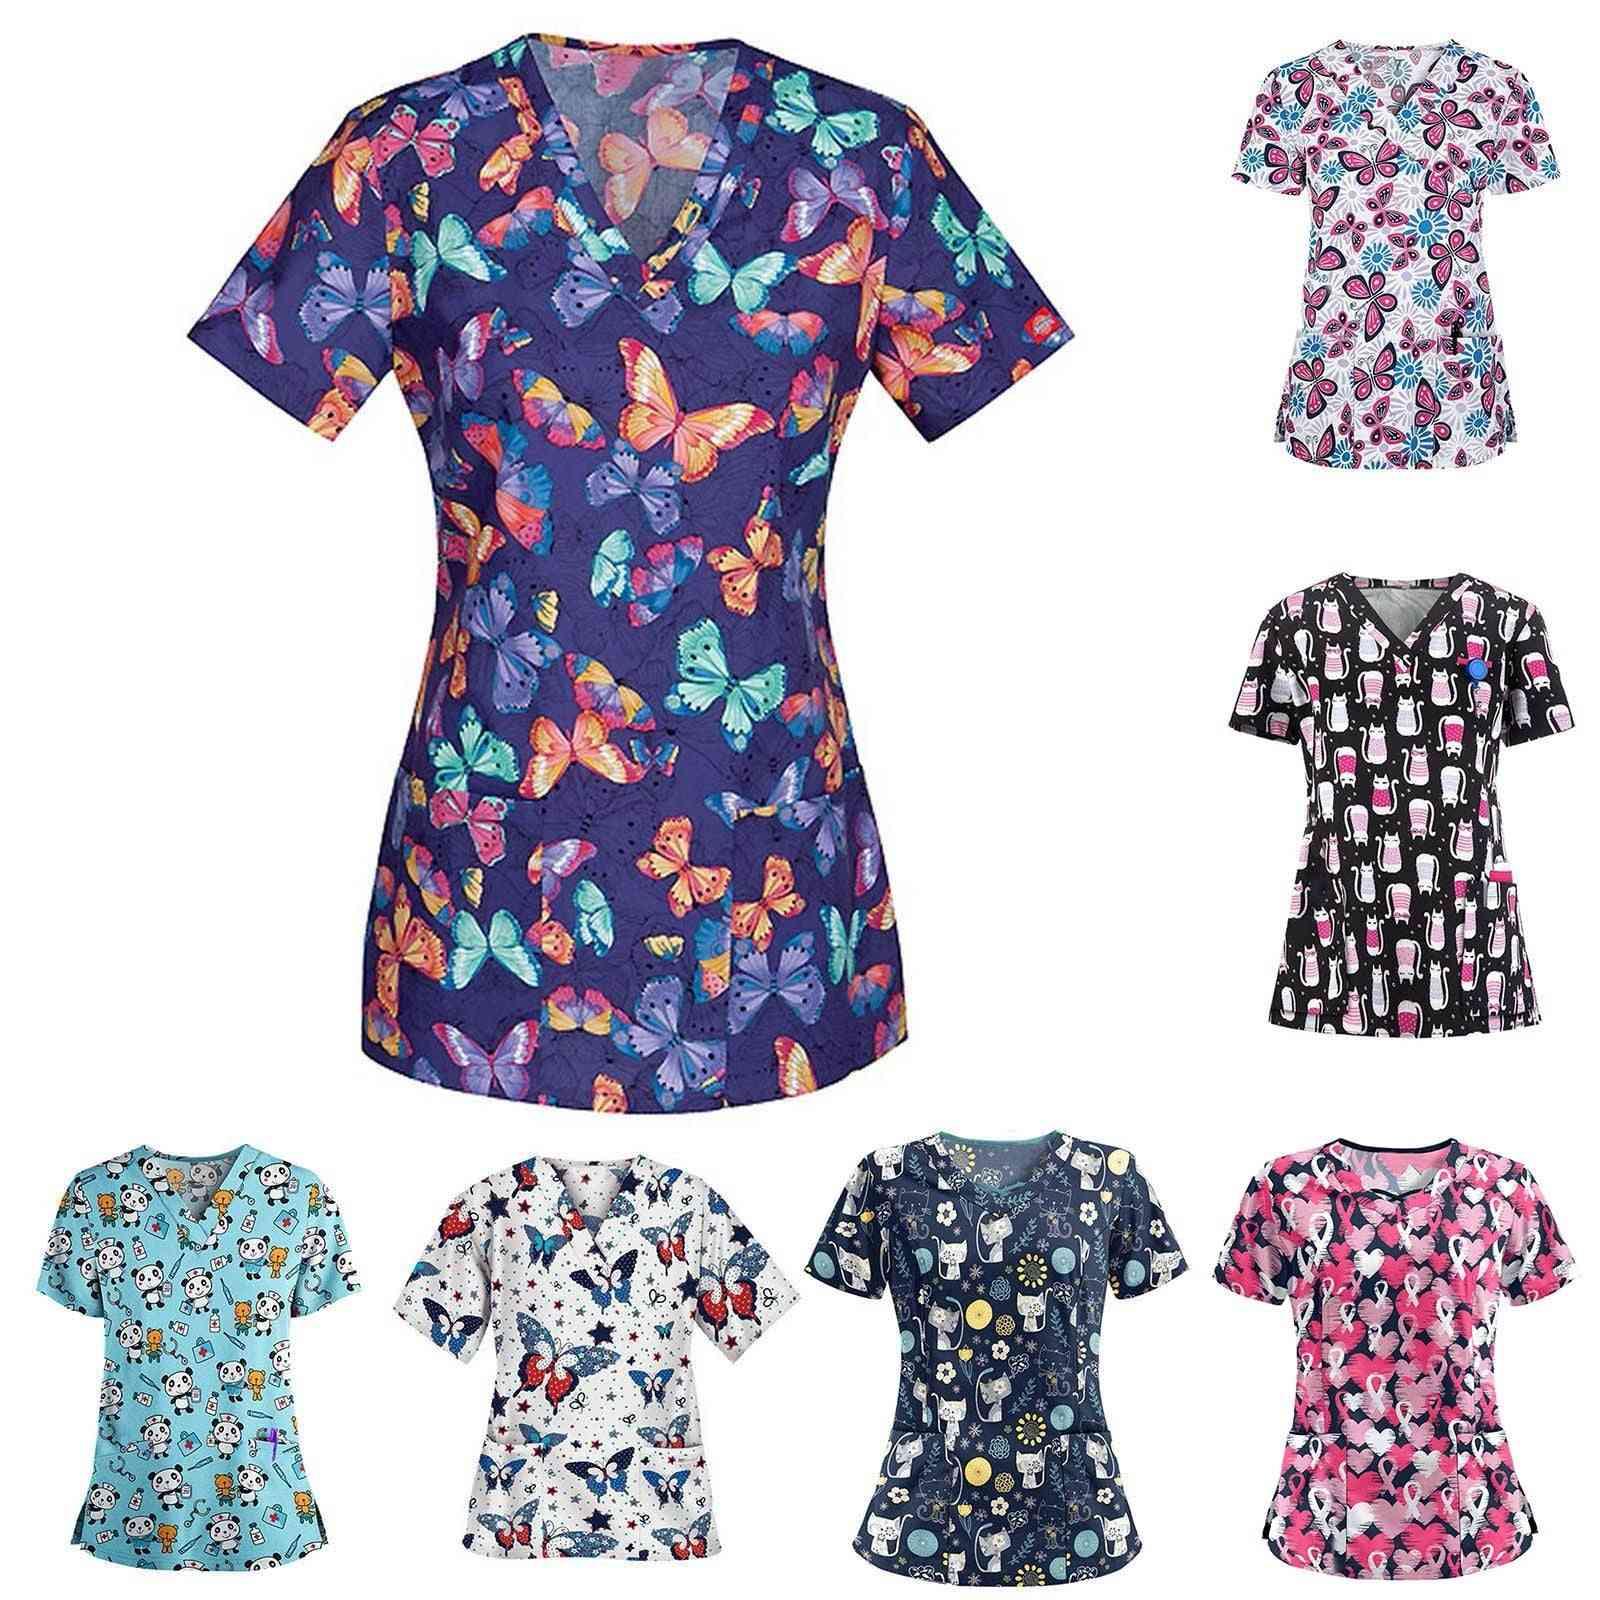 Women Nurse Uniform Short Sleeve V-neck Tops Clinical Working Uniform